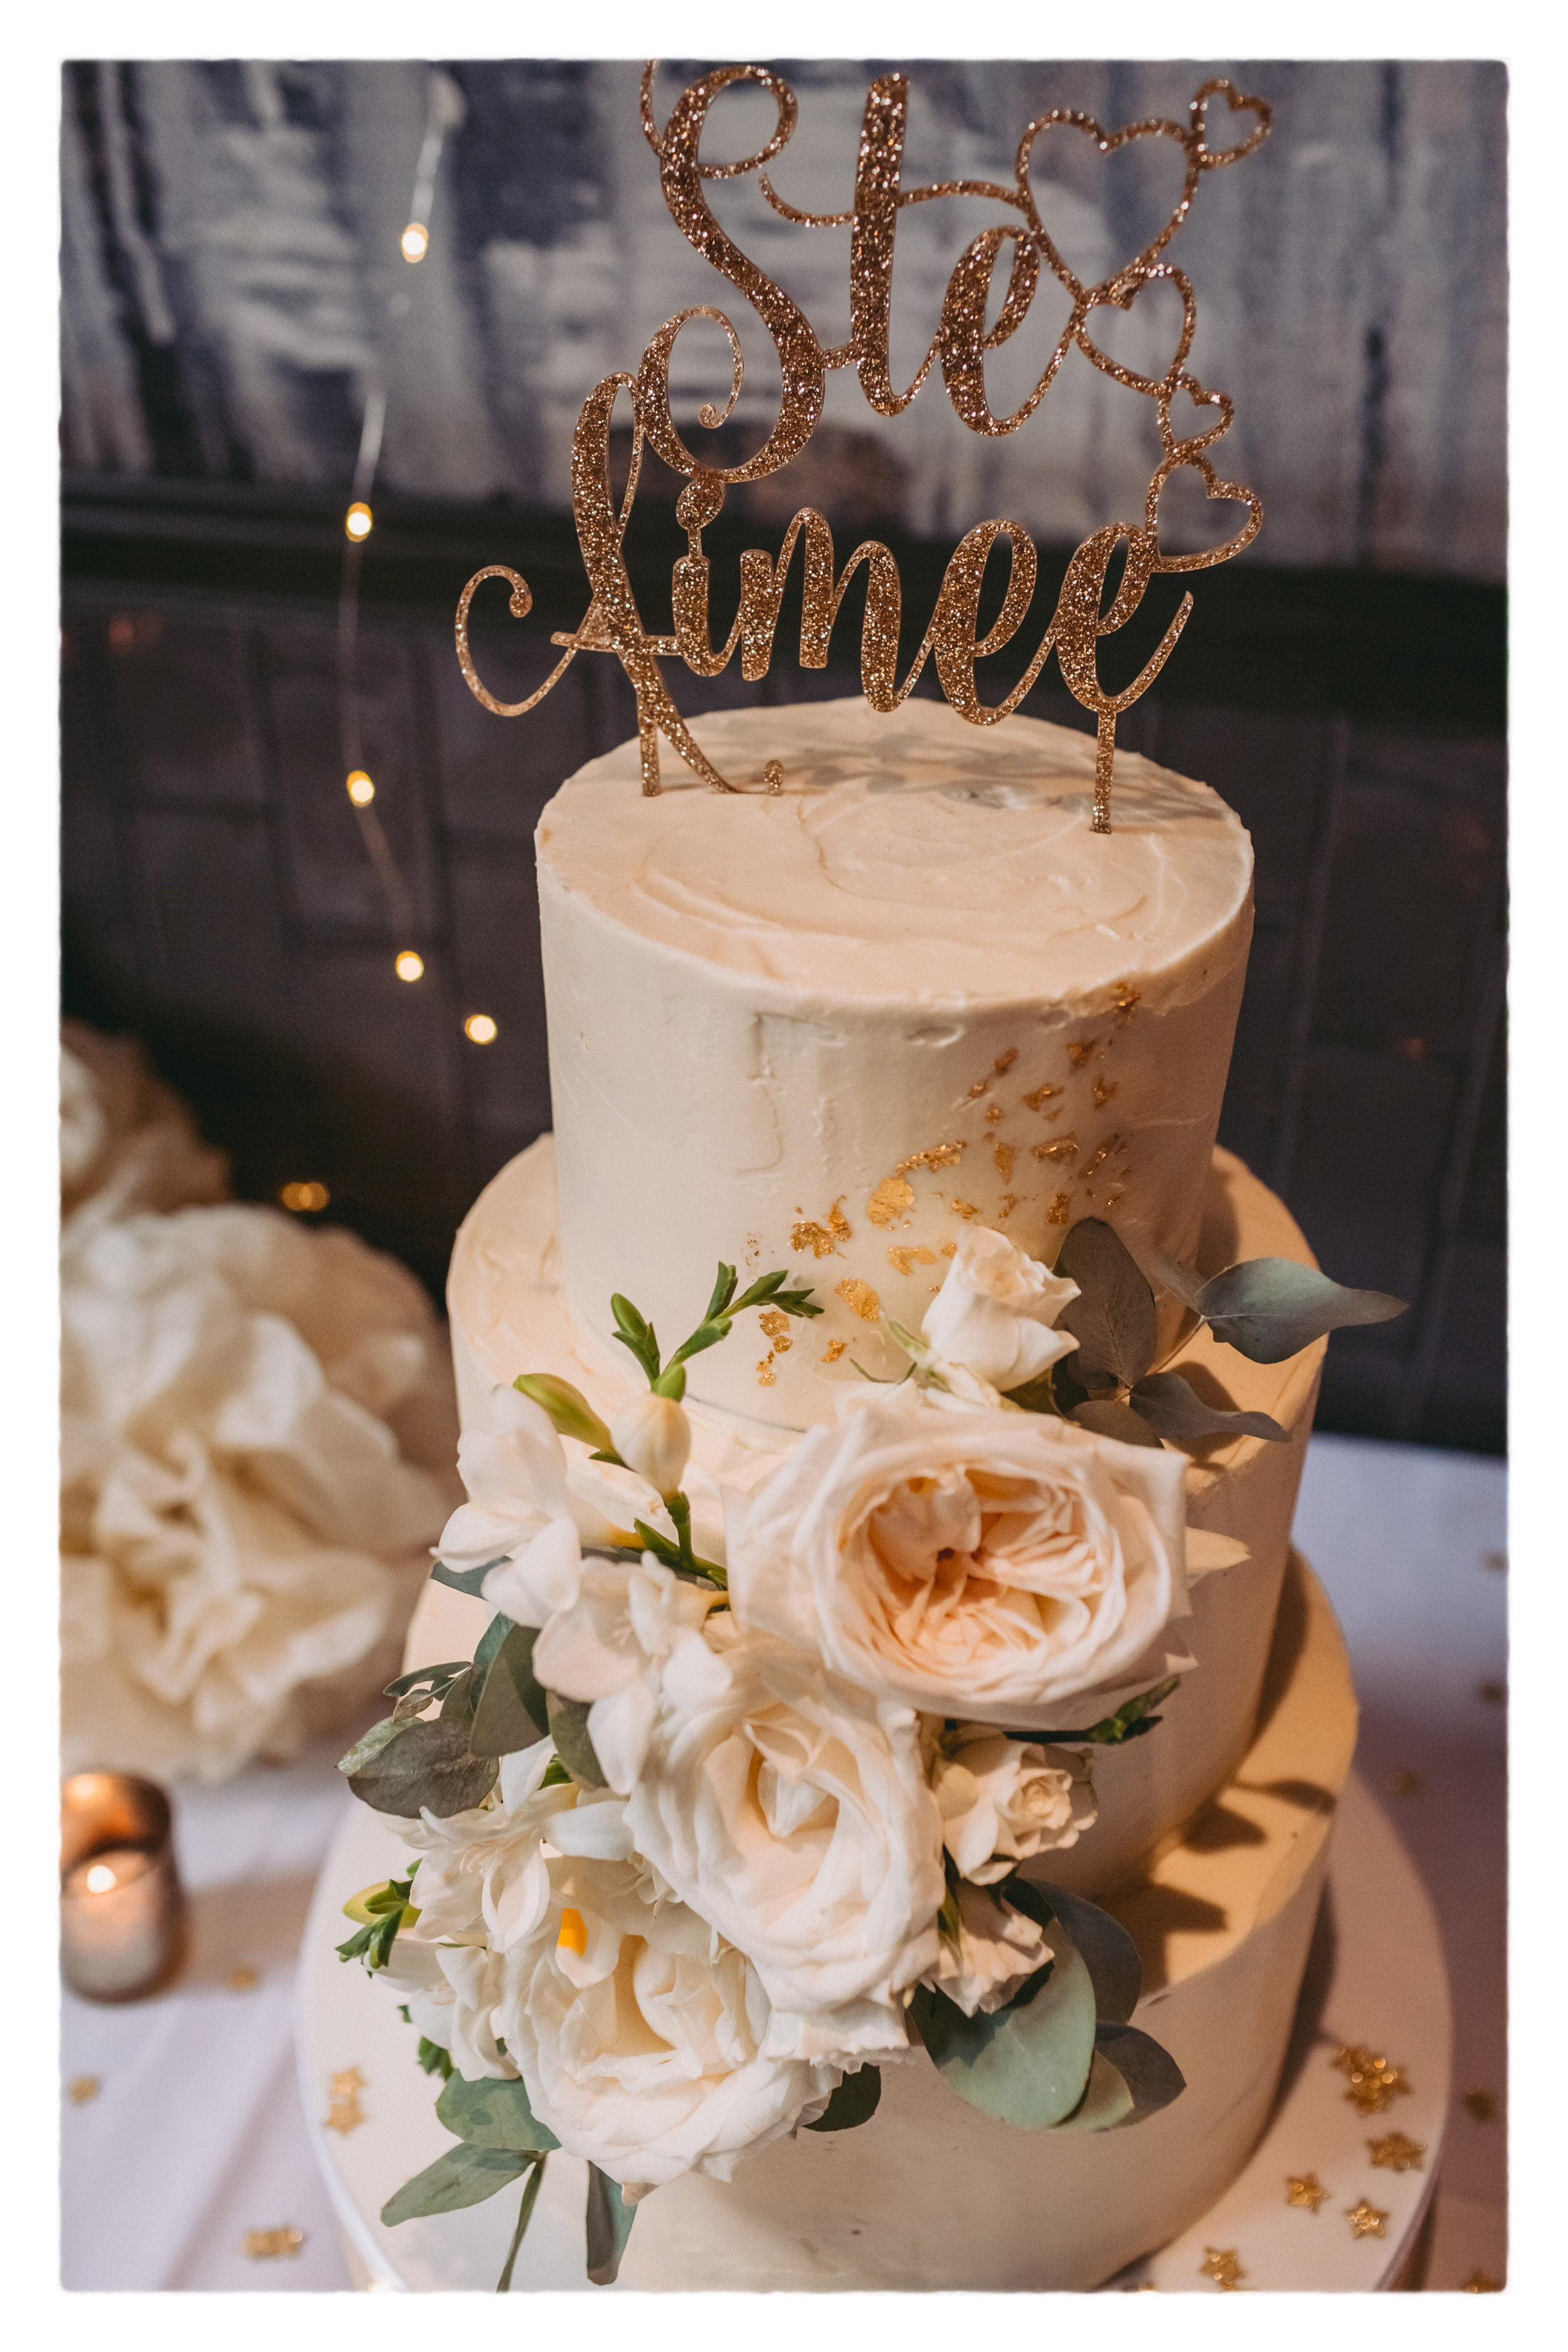 Ste-Aimee-WeddingCake-AlexanderNewtonPhotography